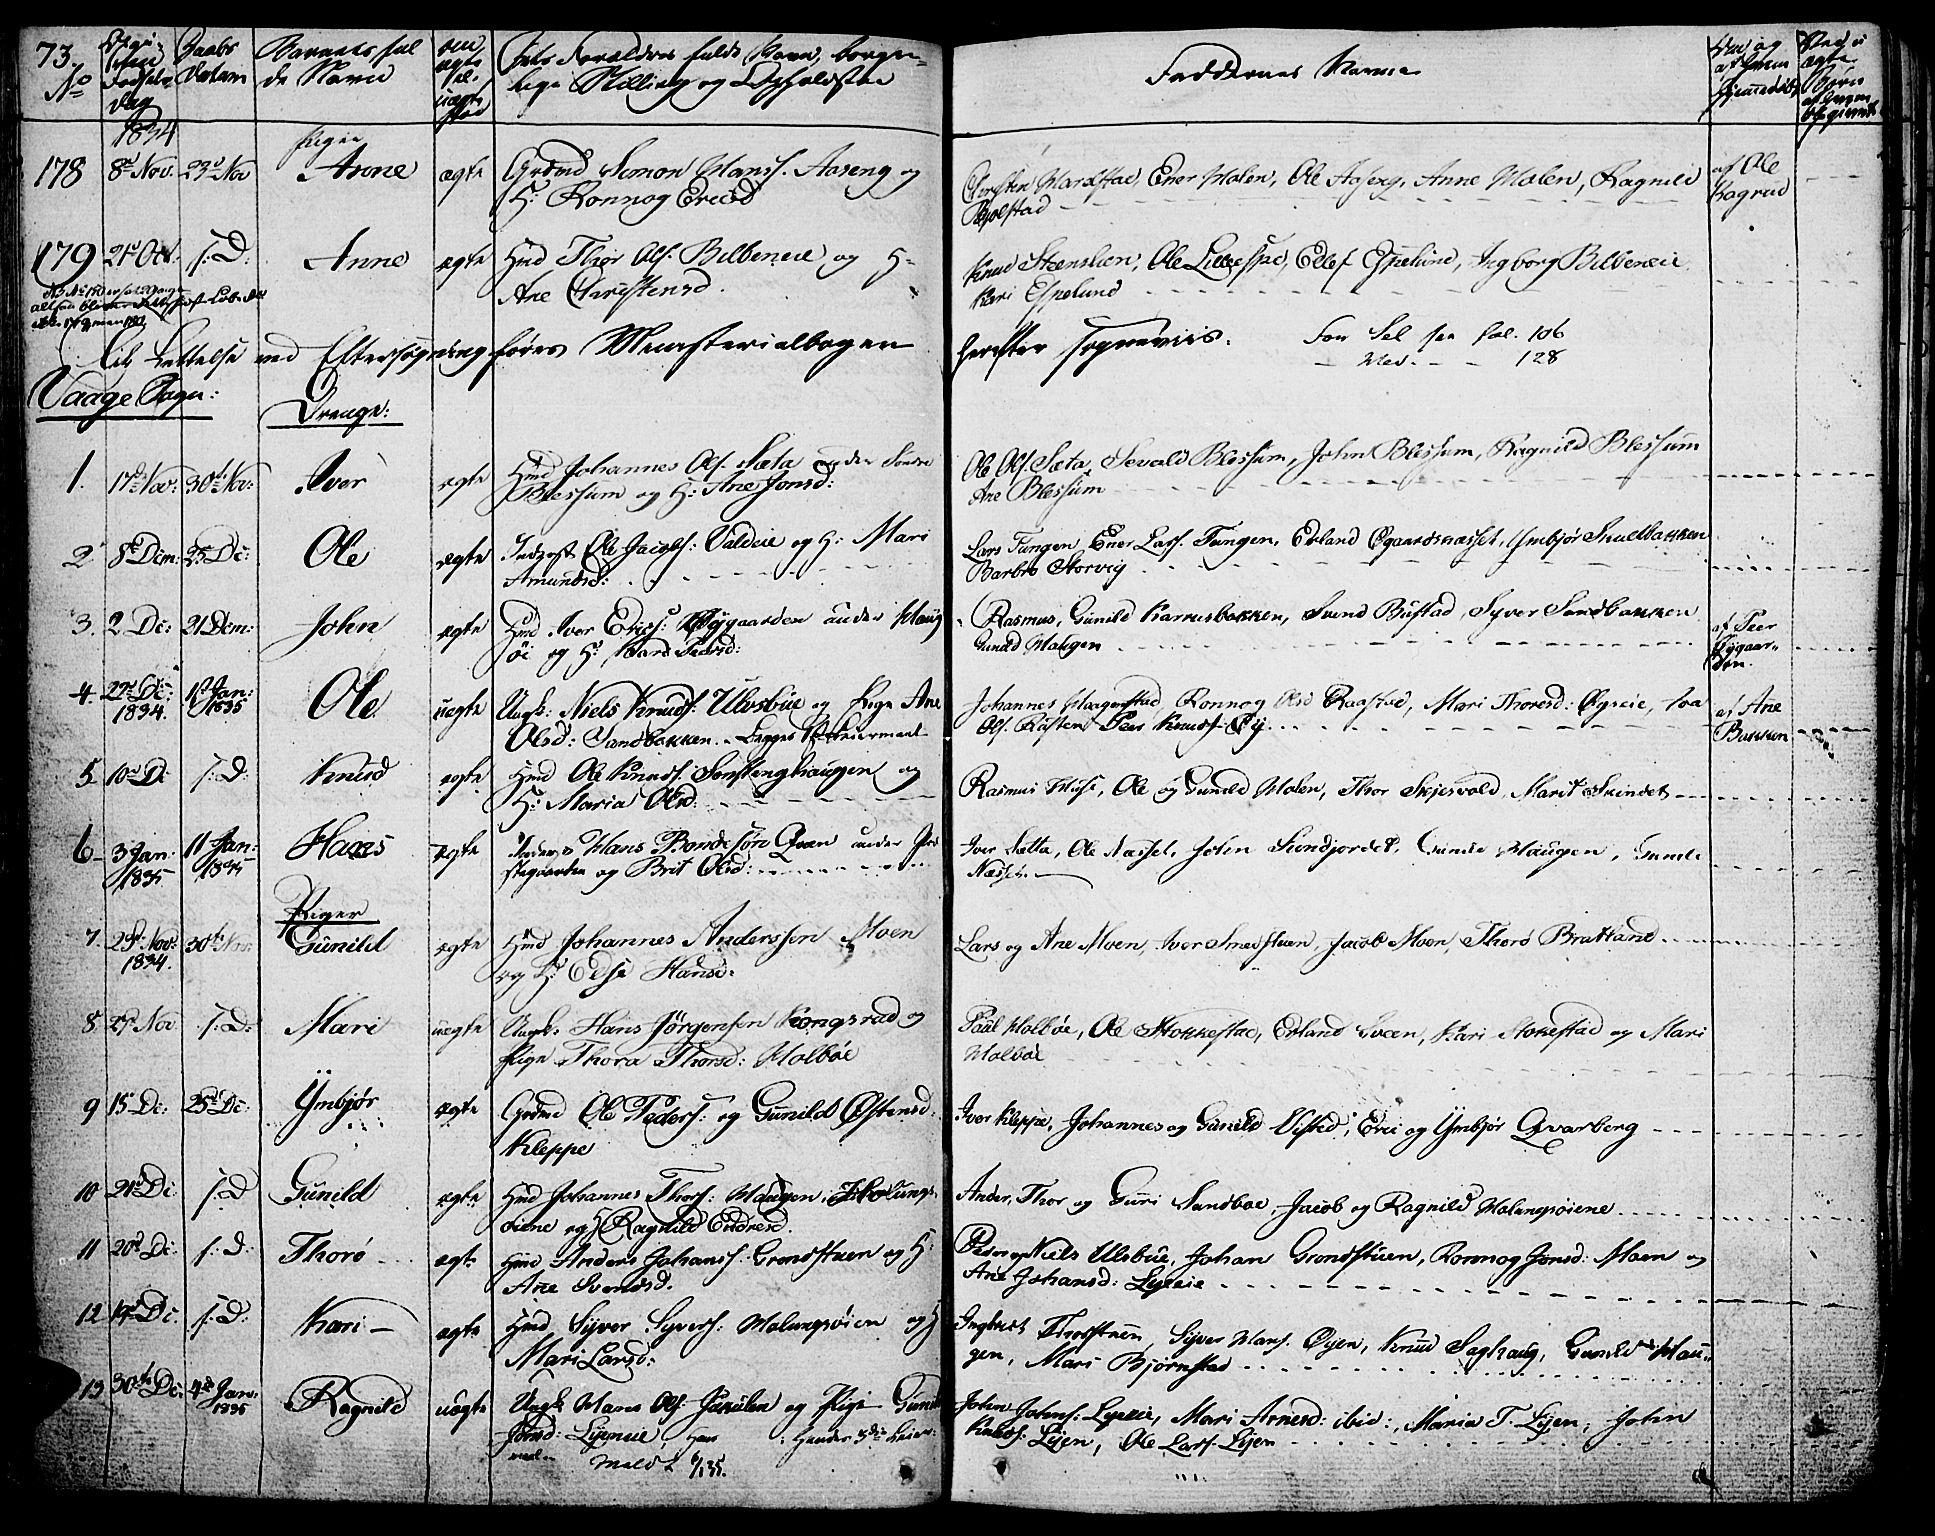 SAH, Vågå prestekontor, Ministerialbok nr. 4 /1, 1827-1842, s. 73